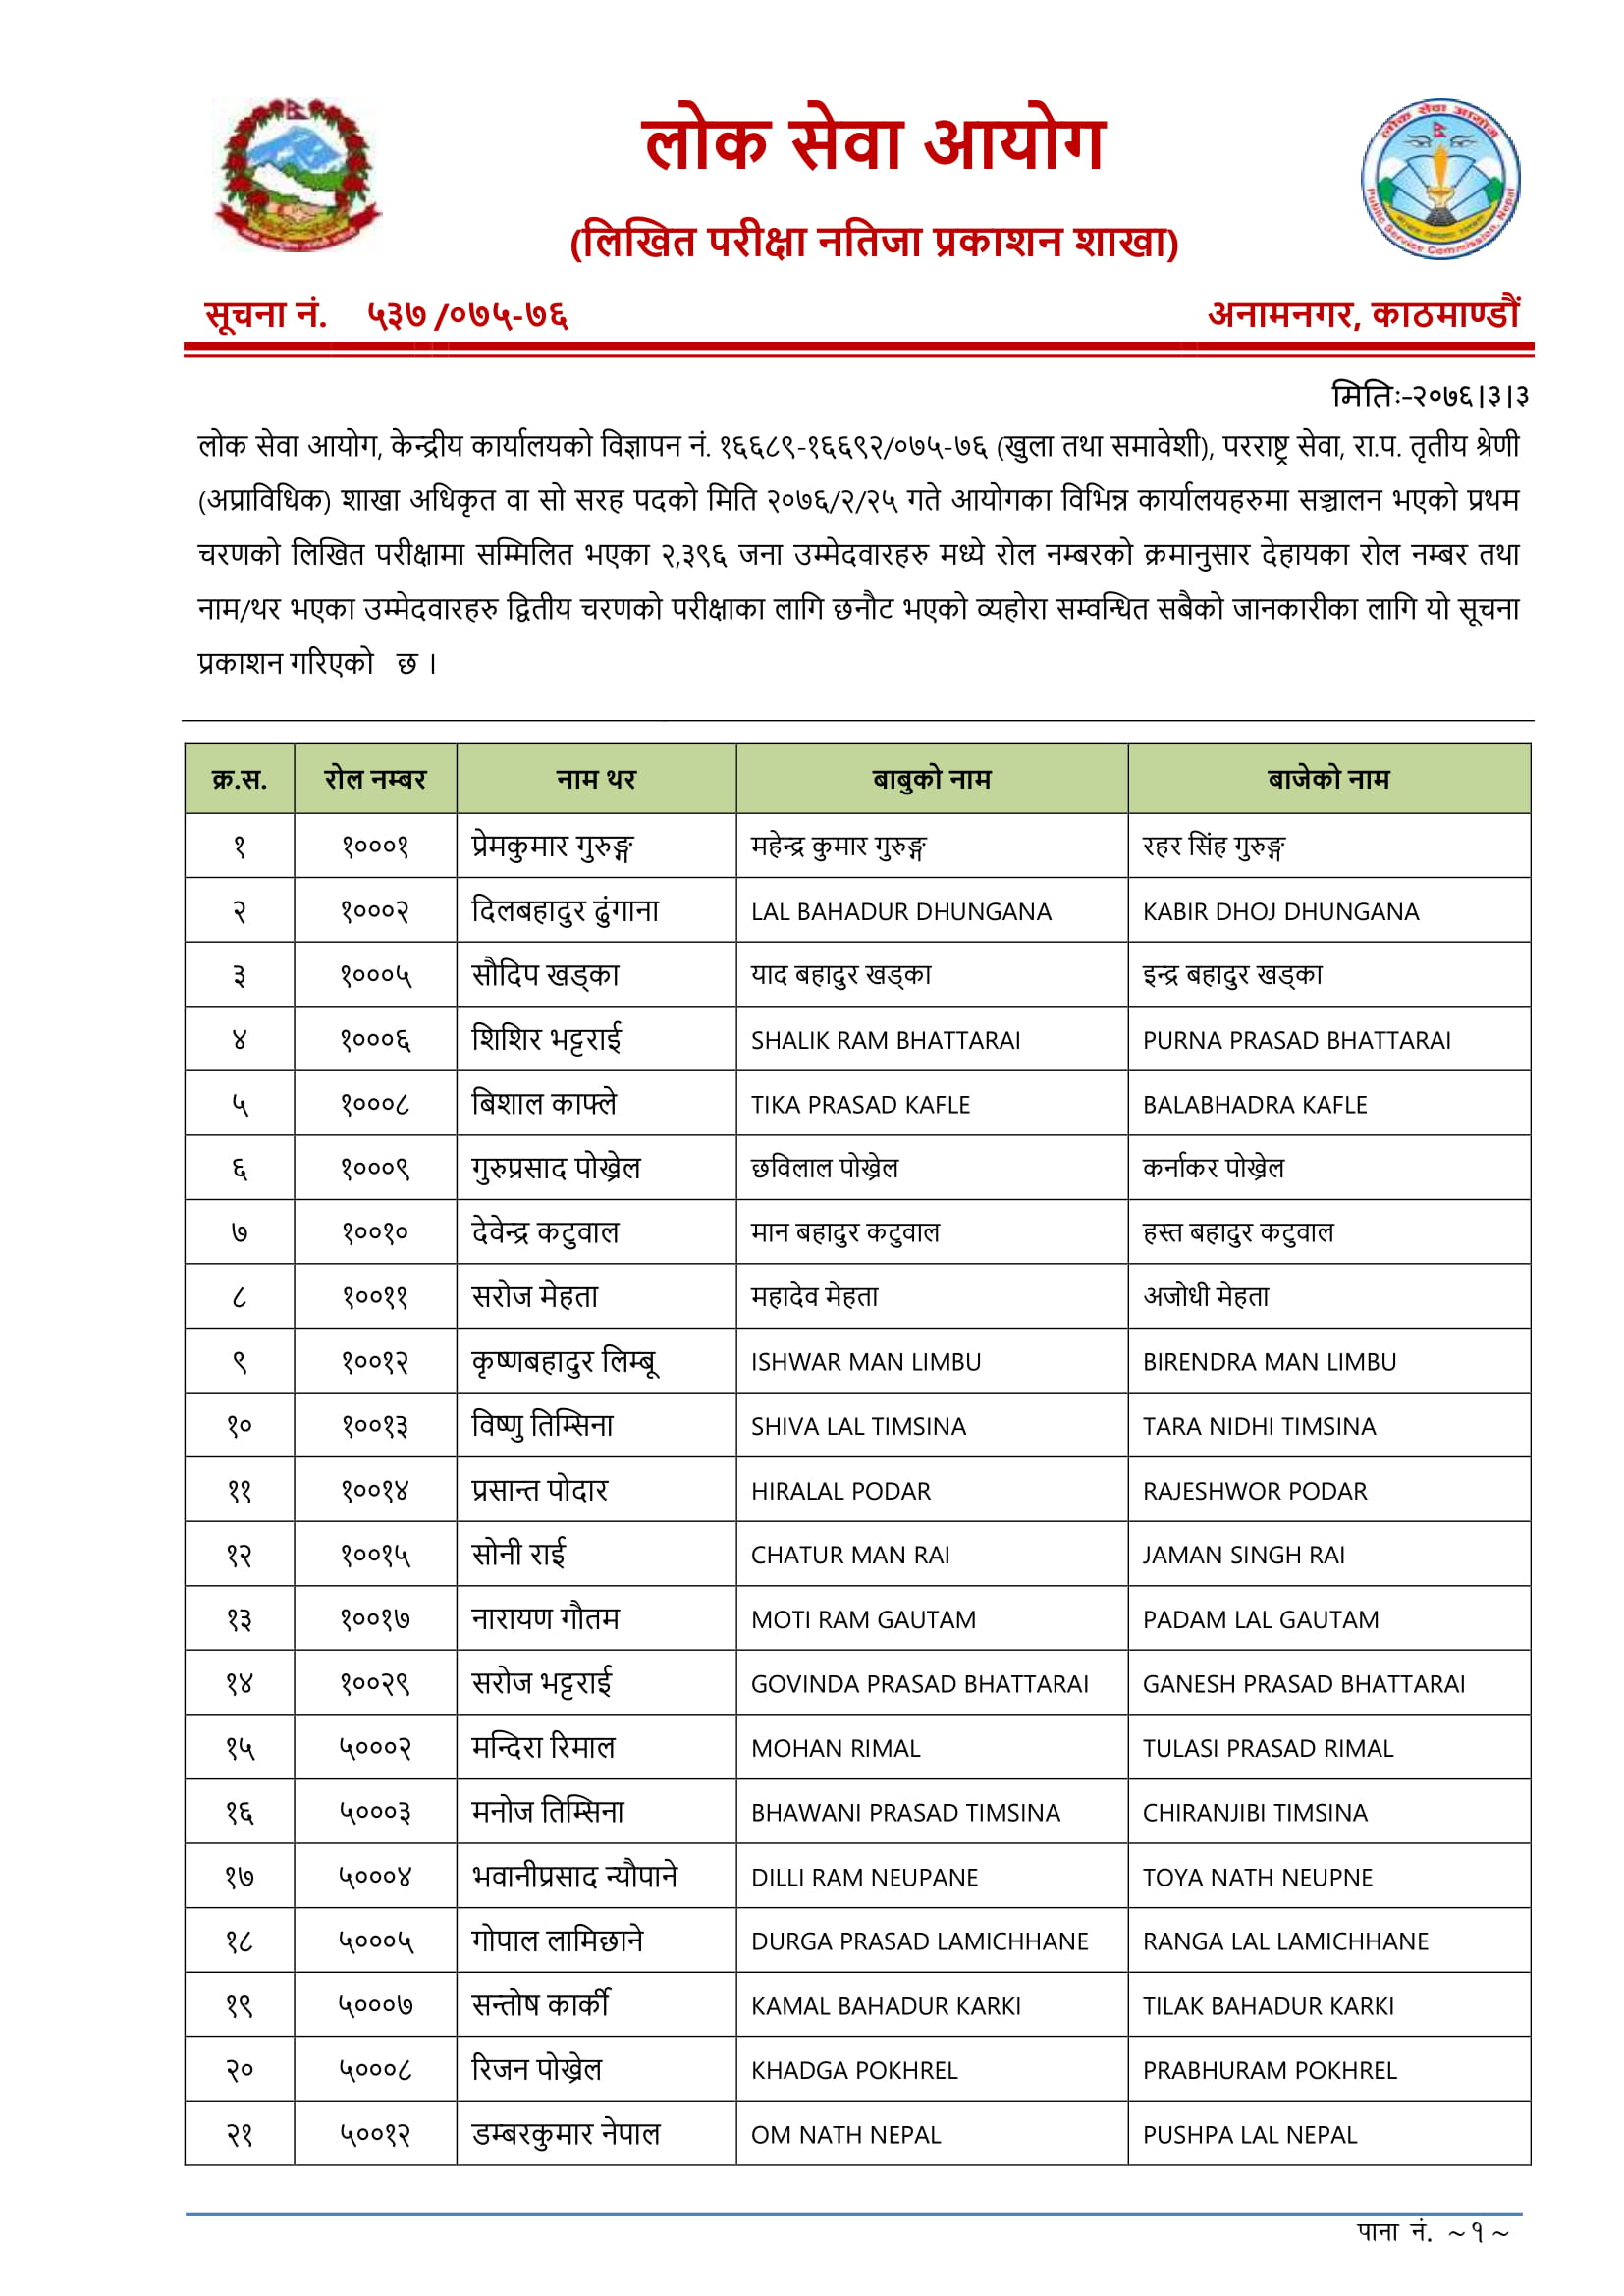 Lok Sewa Aayog Shakha, Adhikrit Results,  Shakha Adhikrit Results, Adhikrit Results 2076,  Shakha Adhikrit Results 2076,Lok Sewa Aayog Exam Results, Lok Sewa Aayog Exam Results 2076, Lok Sewa Aayog Exam Results 2075, Lok Sewa Aayog Exam Results kathmanu, Lok Sewa Aayog Exam Results khotang, Lok Sewa Aayog Adhikrit  Result, Lok Sewa Aayog Adhikrit  Result 2076, lok sewa natija, lok sewa aayog result 2075, loksewa result 2075, lok sewa aayog, www.psc.gov.np result 2075, lok sewa Adhikrit  natija, lok sewa aayog Adhikrit  result 2075, loksewa Adhikrit  result 2075, lok sewa aayog, www.psc.gov.np Adhikrit  result 2075, www.psc.gov.np Adhikrit  result, psc.gov.np Adhikrit  result, Adhikrit  results,  Shakh Adhikrit  results, psc result, psc results 2076, psc Nepal, Adhikrit  result 2076, Adhikrit  result list, नायब सुब्बा, लोक सेवा आयोग नतिजा , नायब सुब्बा नतिजा, ना.सु नतिजा